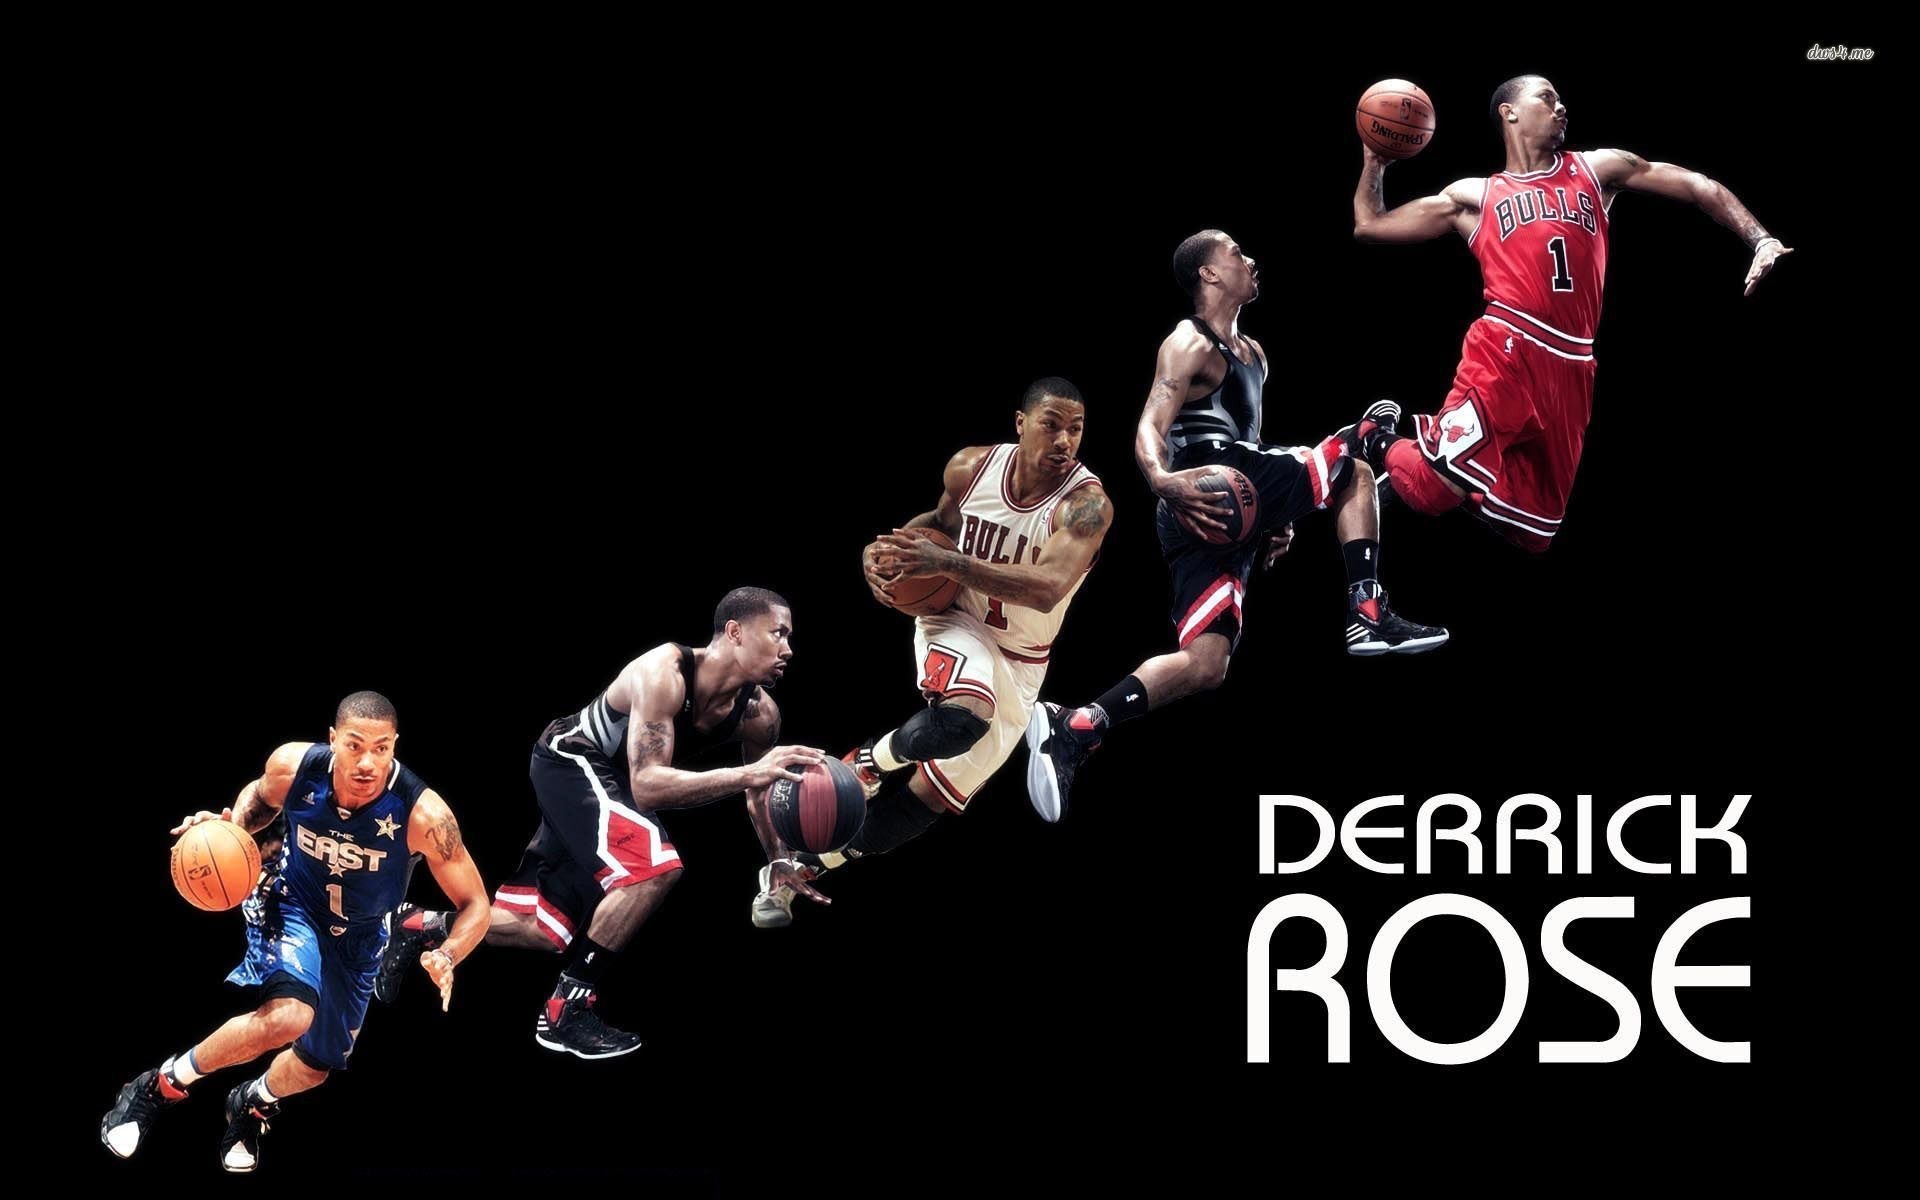 derrick rose chicago bulls basketball